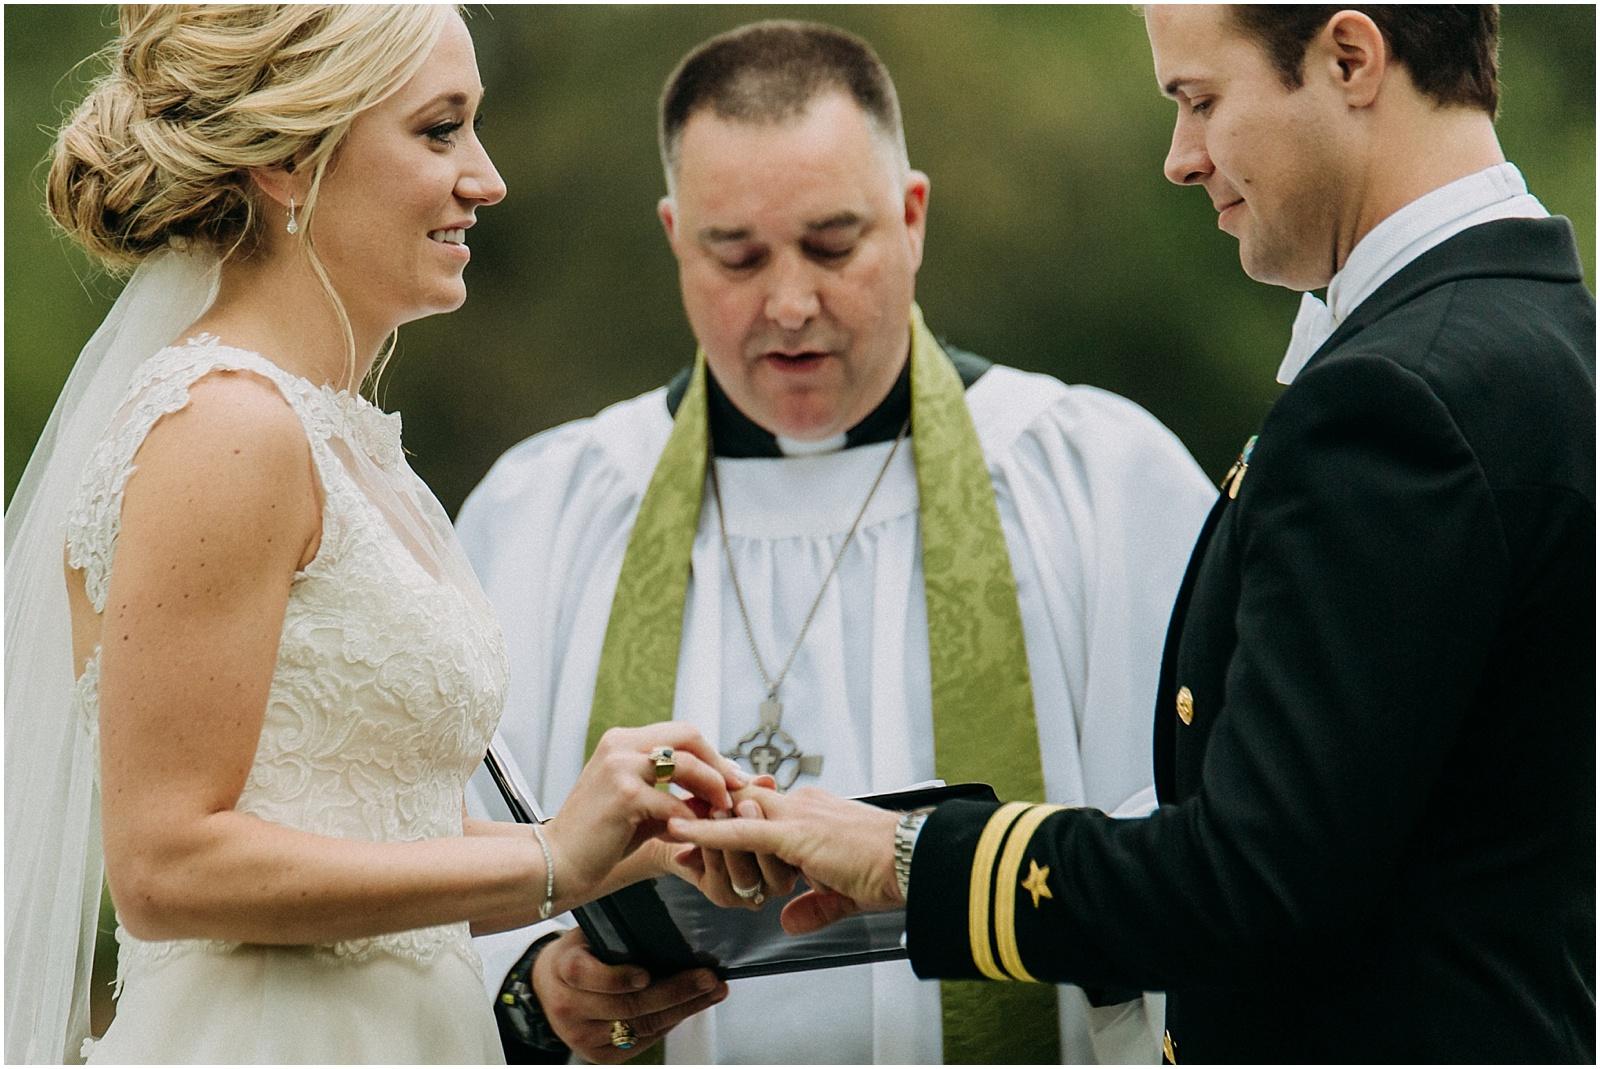 glen_echo_st_louis_mo_wedding_0109.jpg